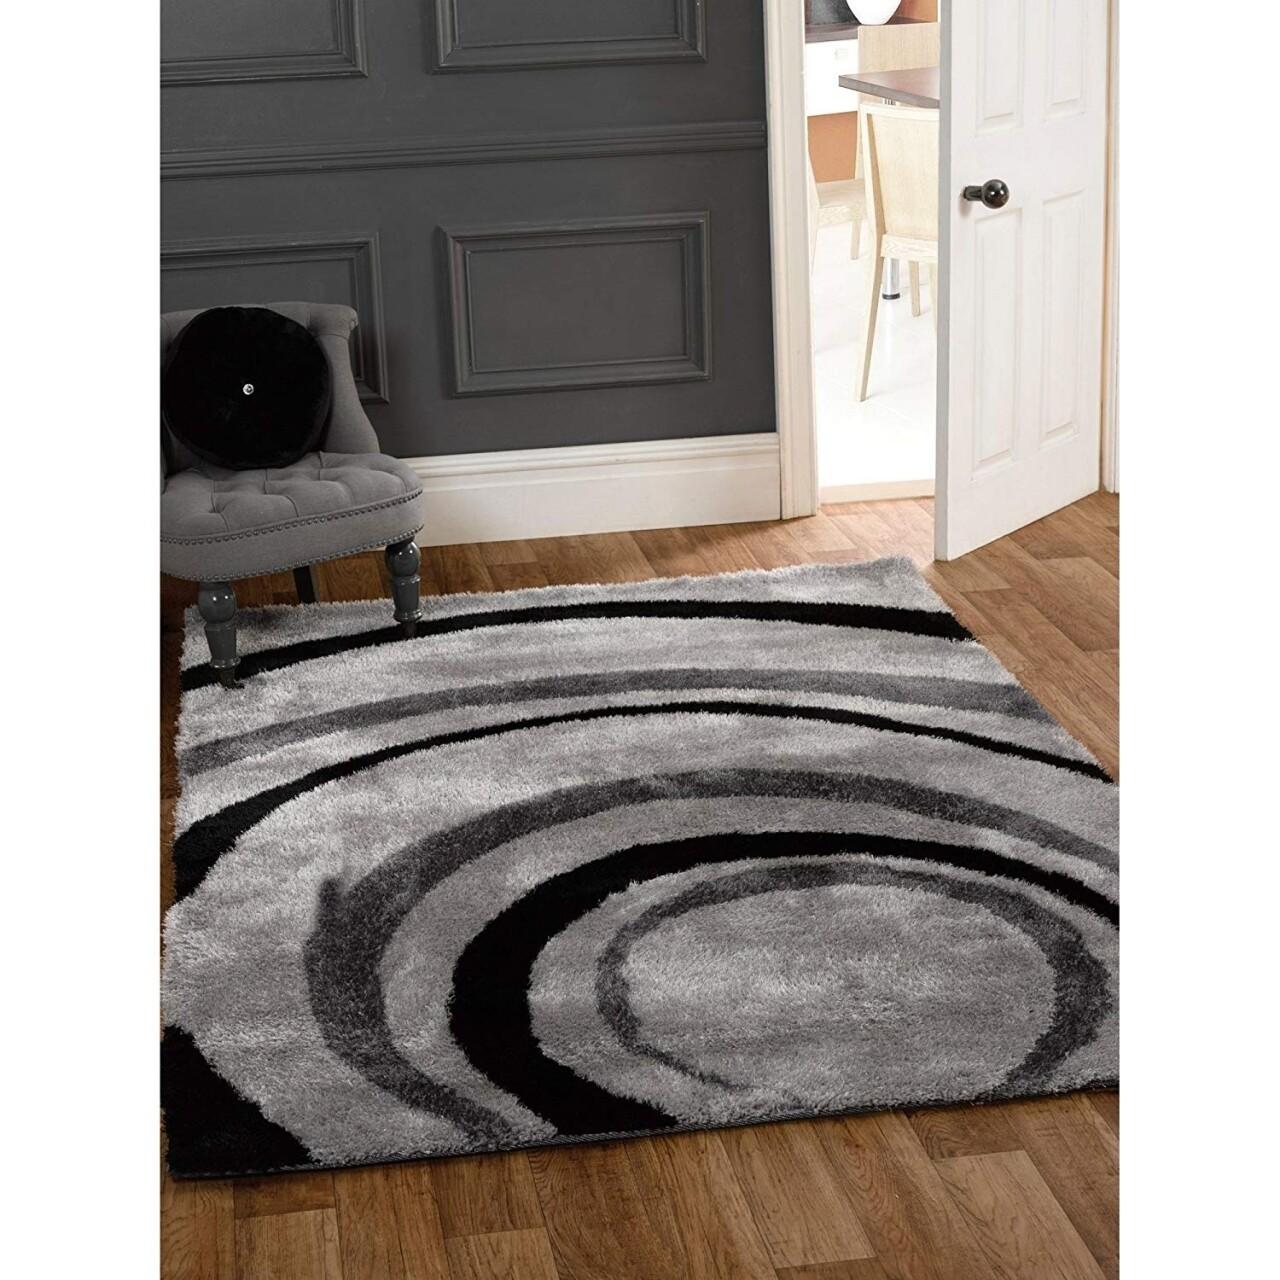 Covor Velvet Droplet, Flair Rugs, 120 x 170 cm, 100% polipropilena, gri/negru